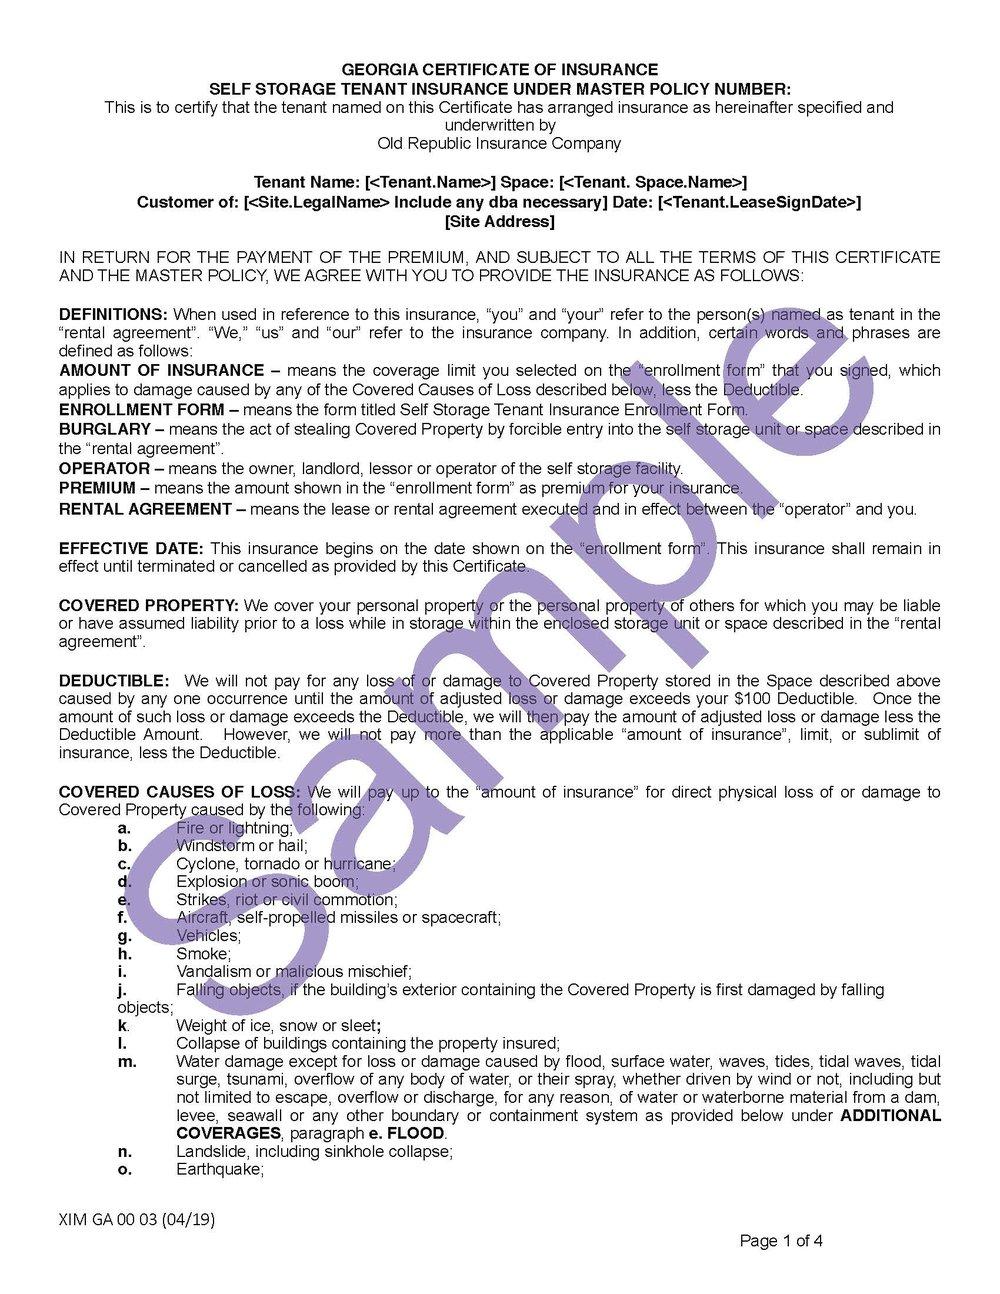 XIM GA 00 03 04 19 Georgia Certificate of Storage InsuranceSample_Page_1.jpg